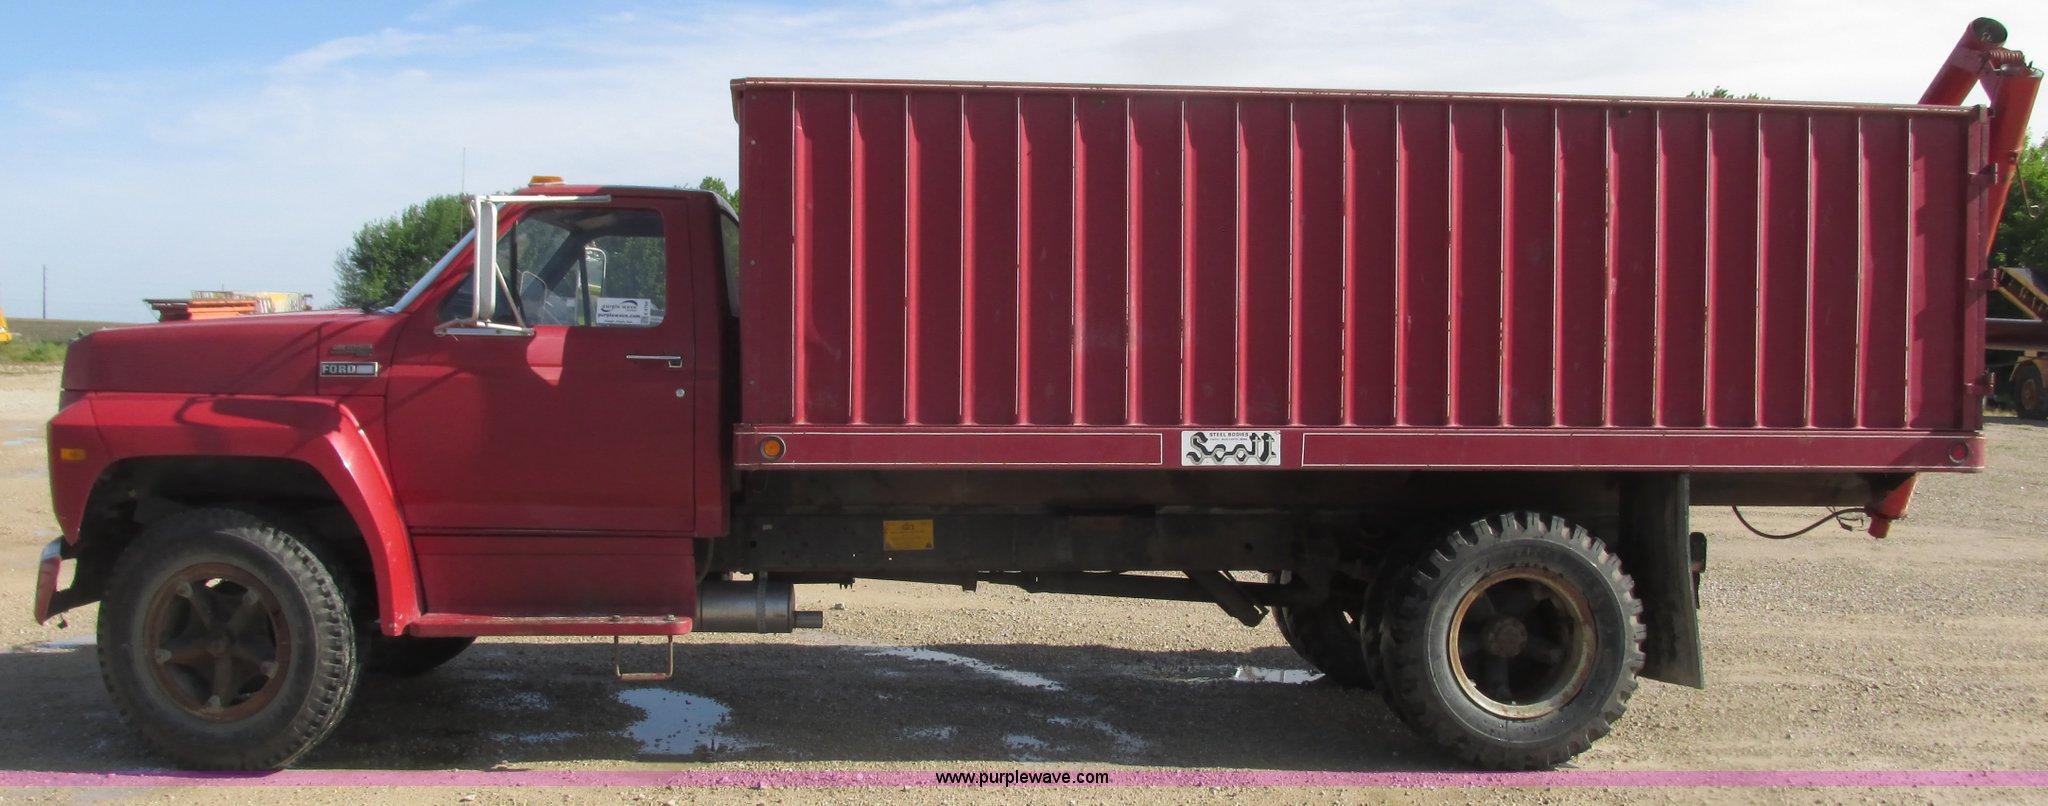 1980 ford grain truck item k4704 sold june 29 ag equipm rh purplewave com 1952 Ford Flatbed Truck Ford Farm Truck